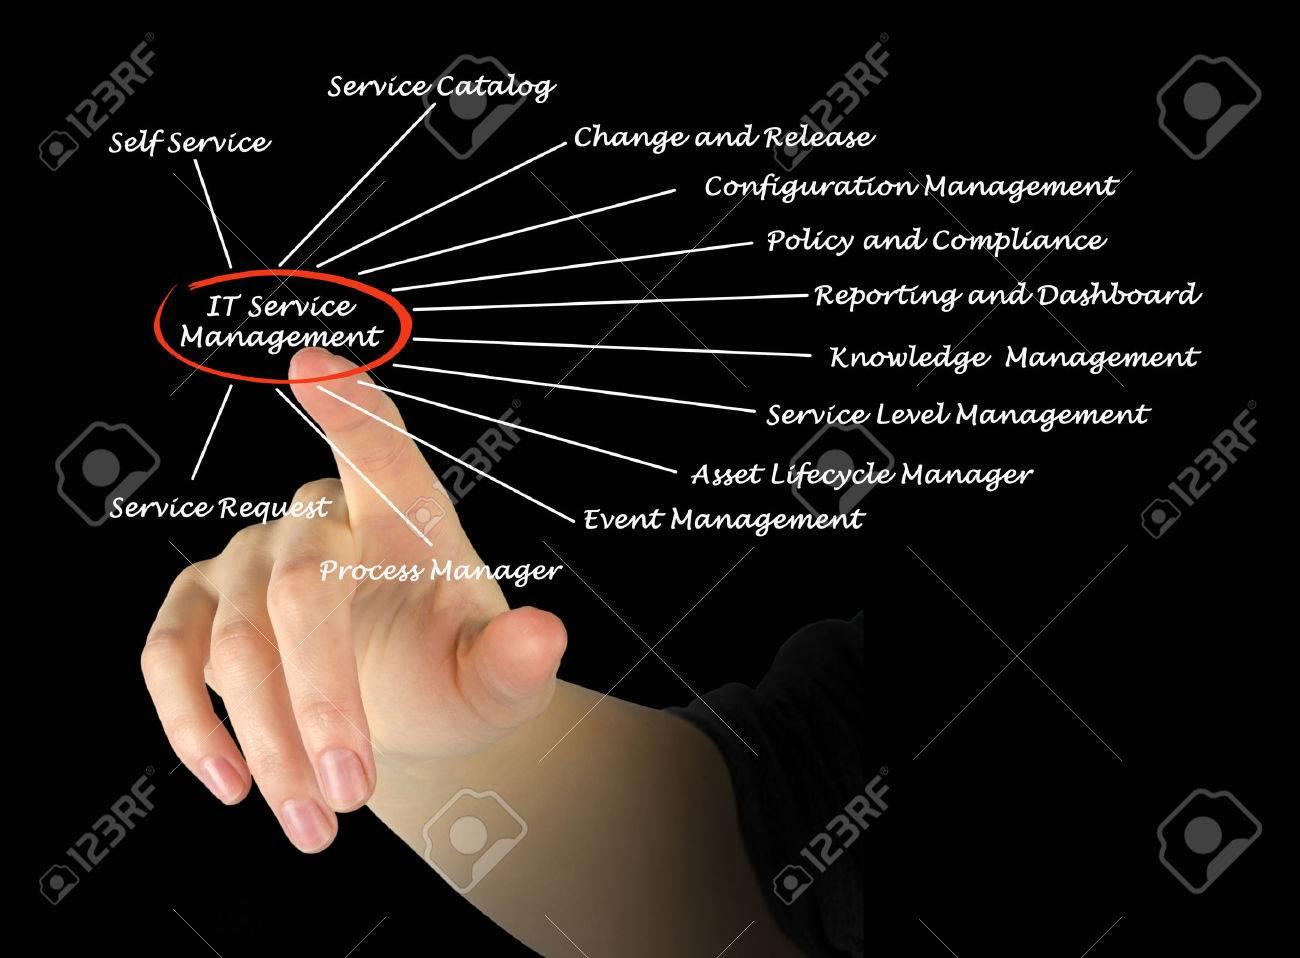 IT Service Management Stock Photo - 32949955